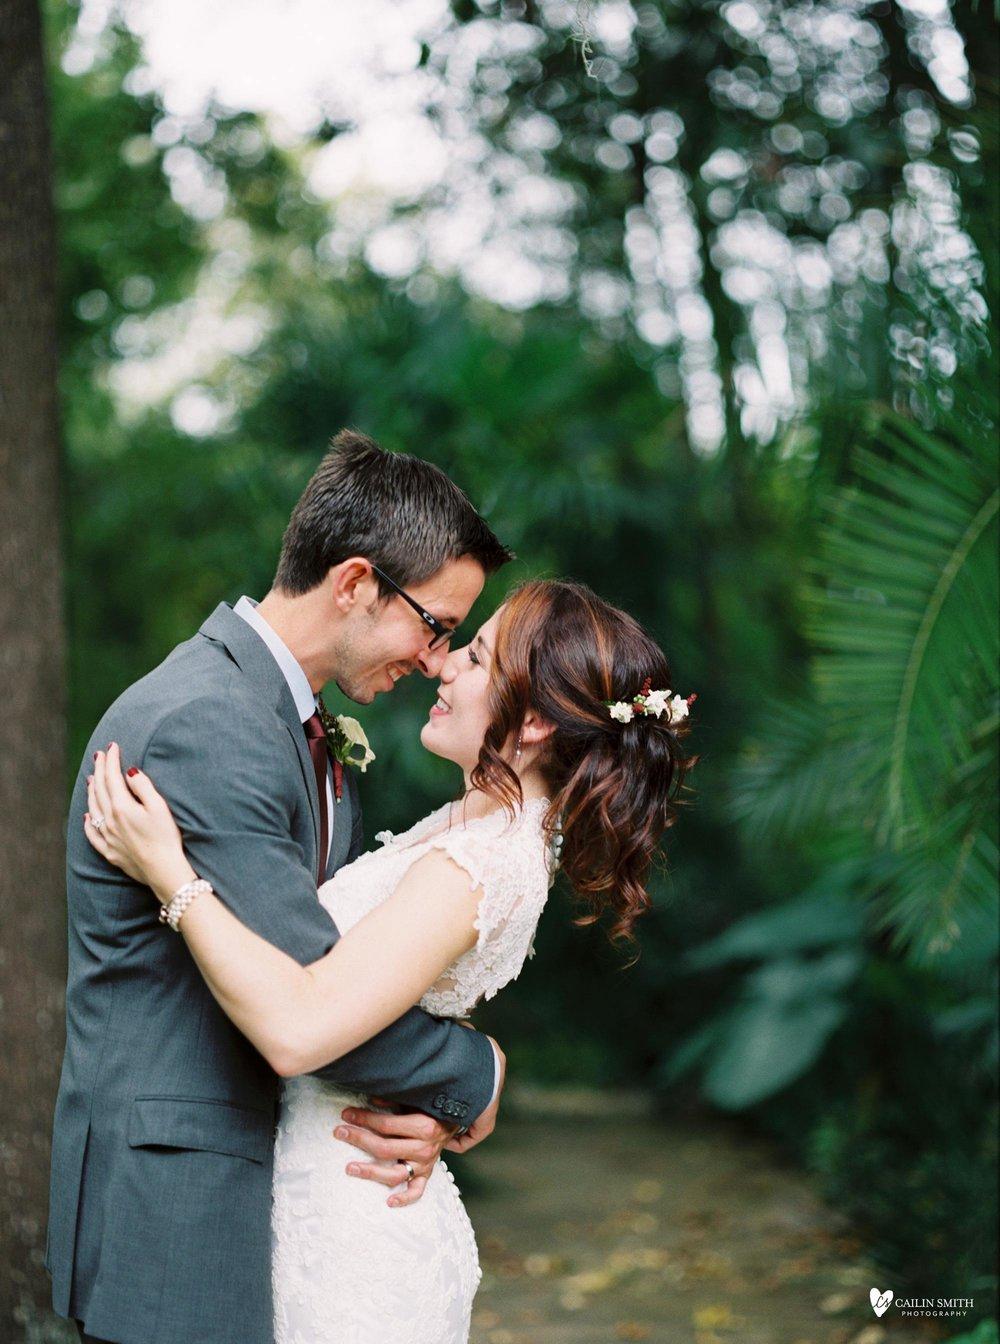 Shelby_Jeff_Ponte_Vedra_Hilltop_Club_Wedding_Photography_046.jpg